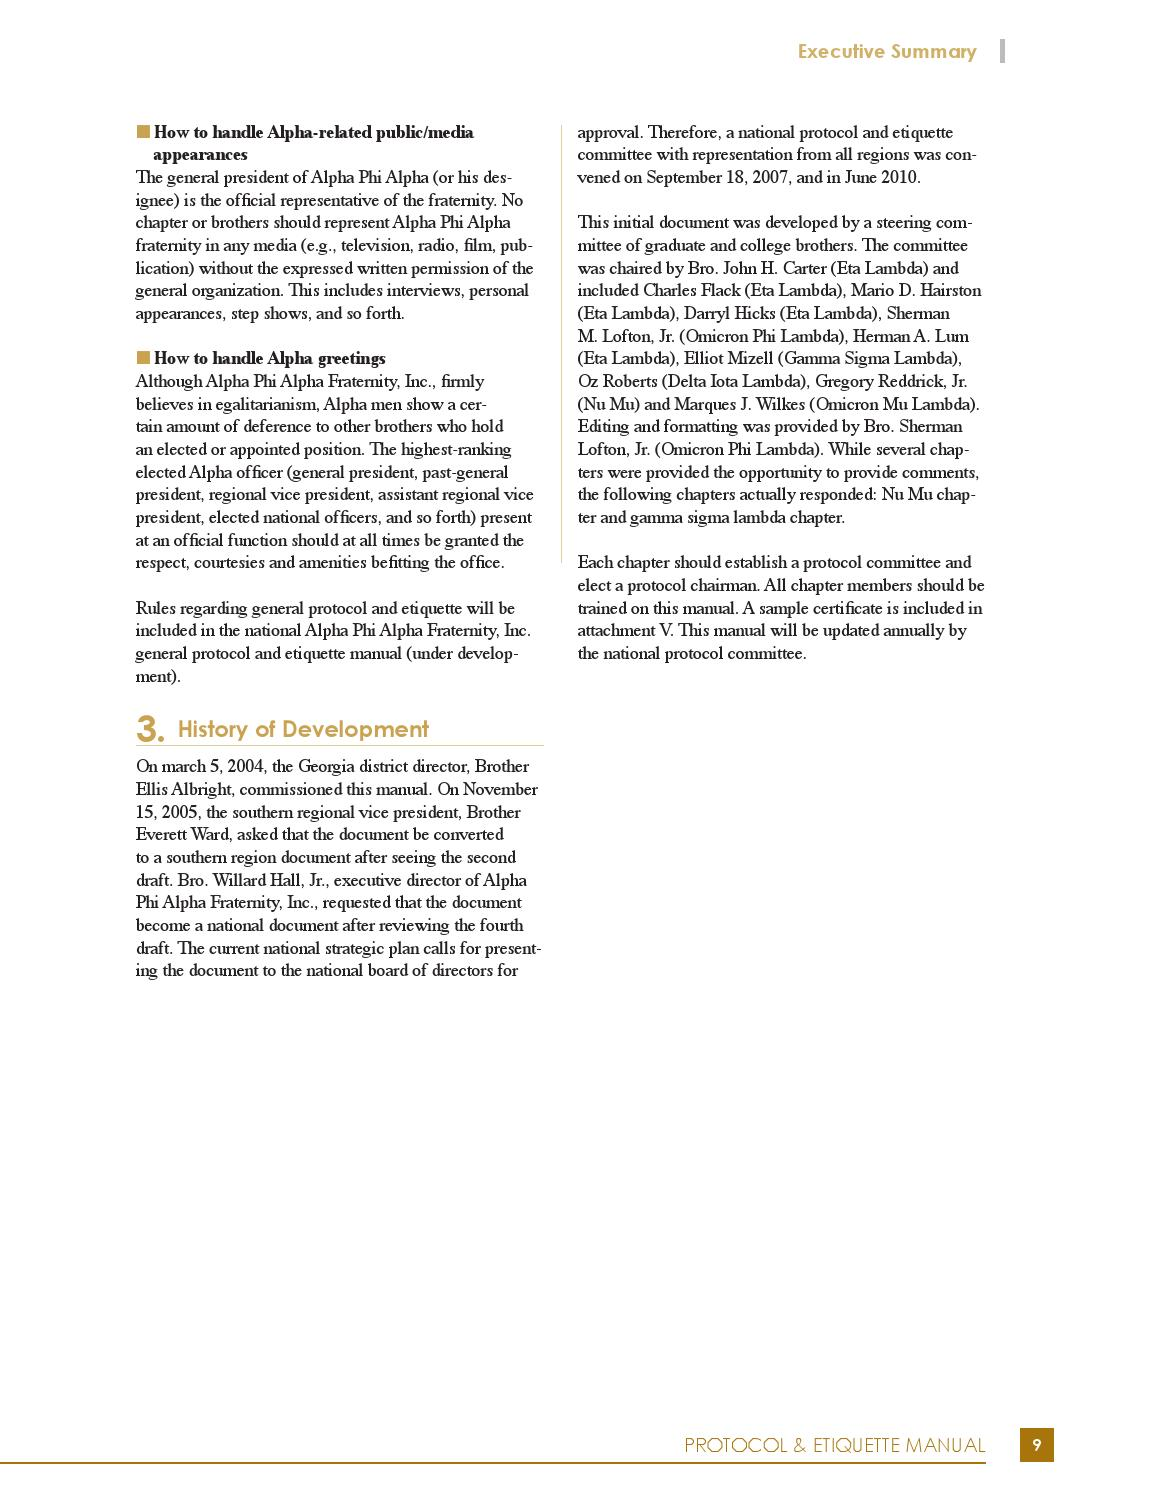 alpha protocol  u0026 etiquette manual by alpha phi alpha